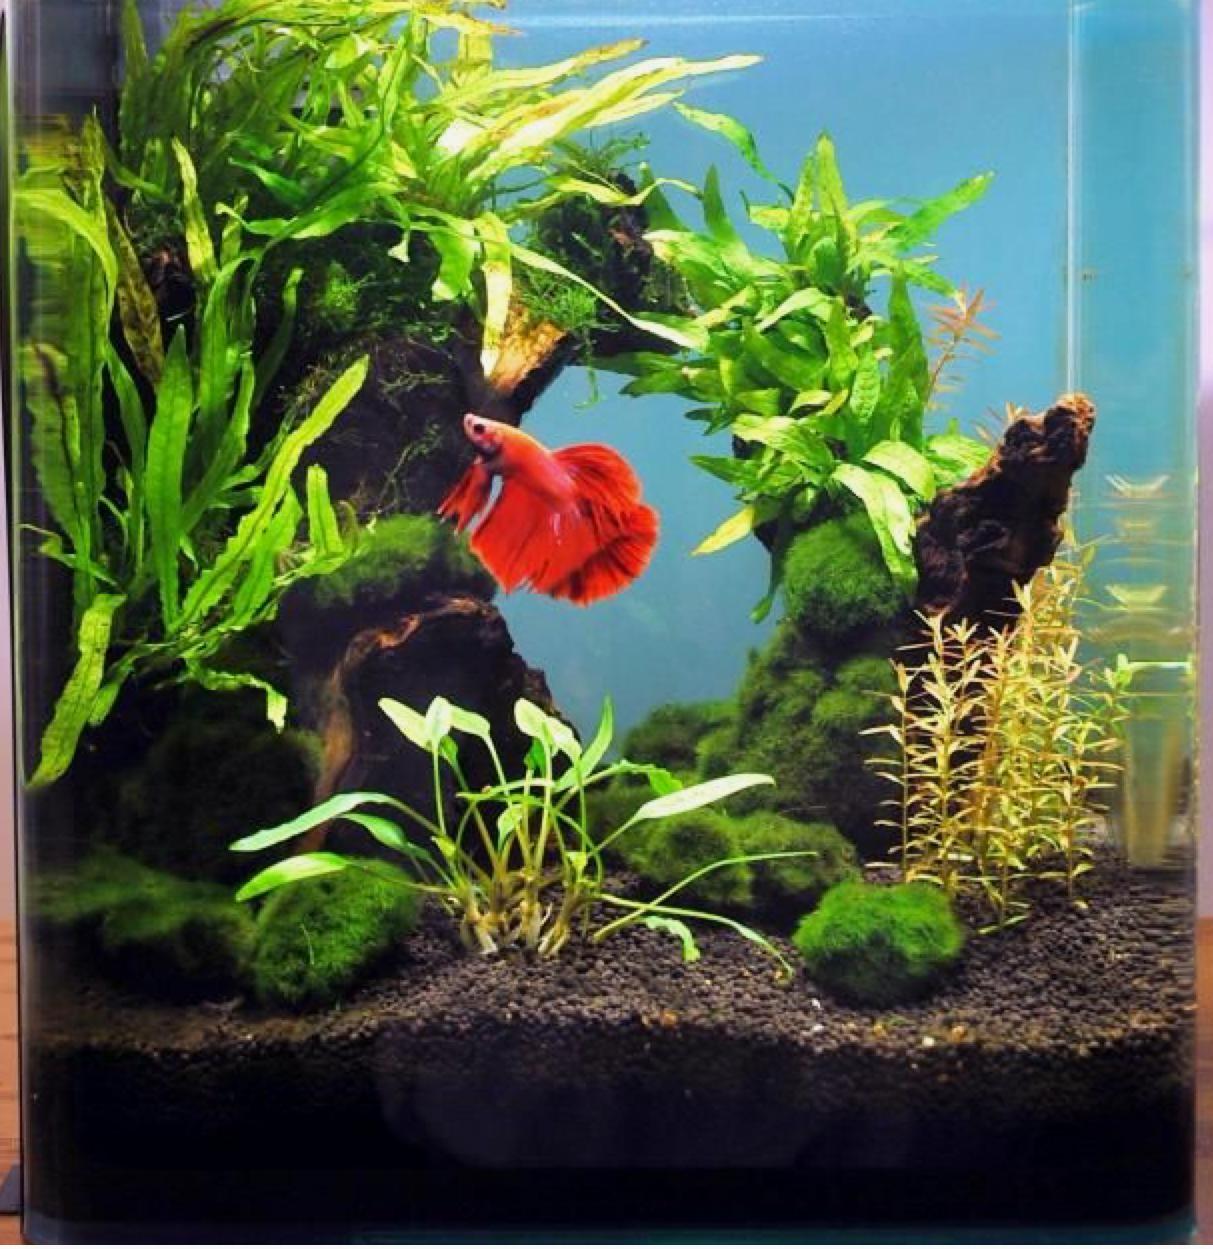 nuôi cá betta trong hồ thủy sinh mini